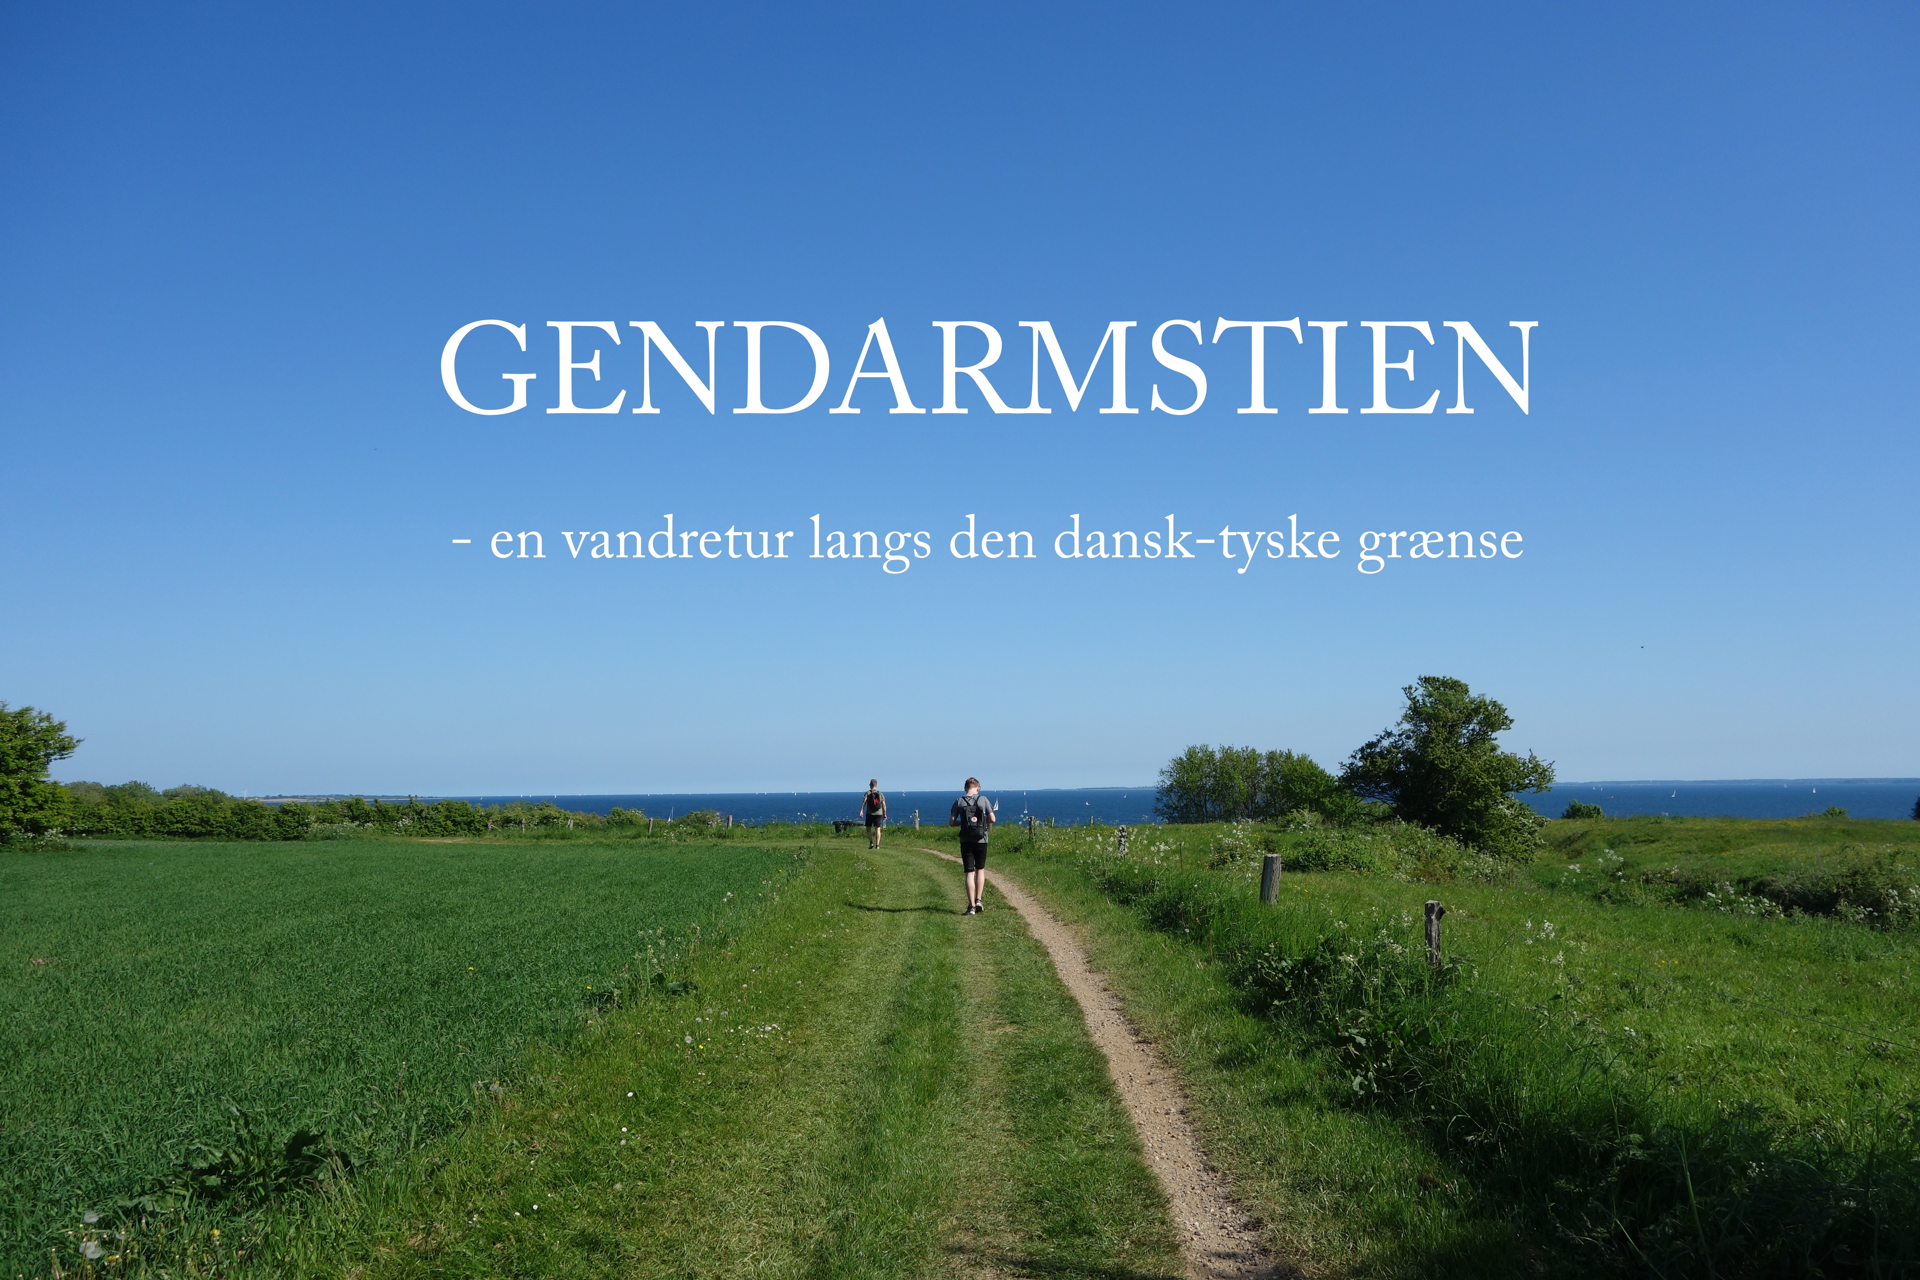 Gendarmstien – en smuk vandretur langs den dansk-tyske grænse